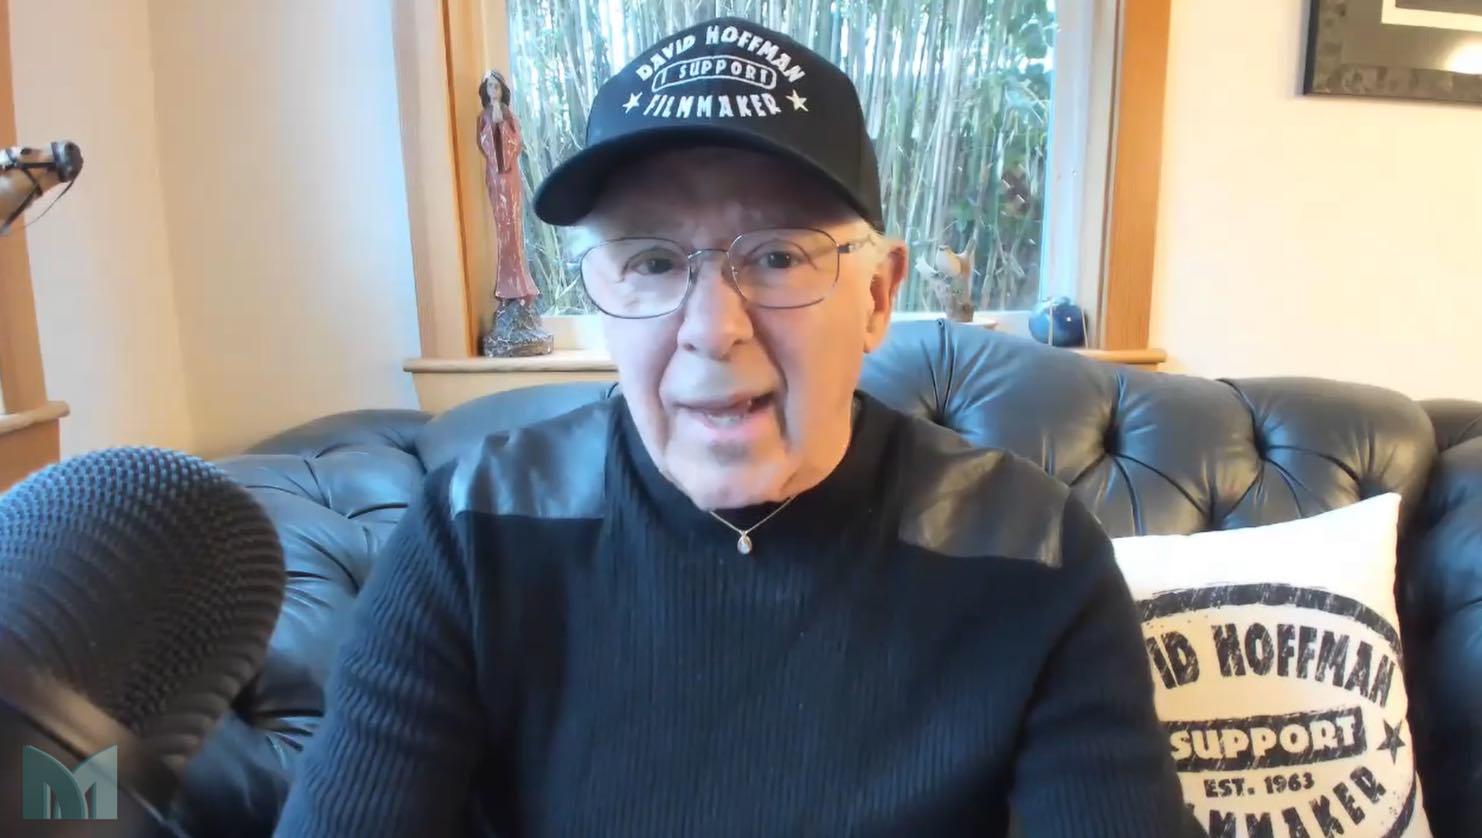 David-Hoffman-Interview